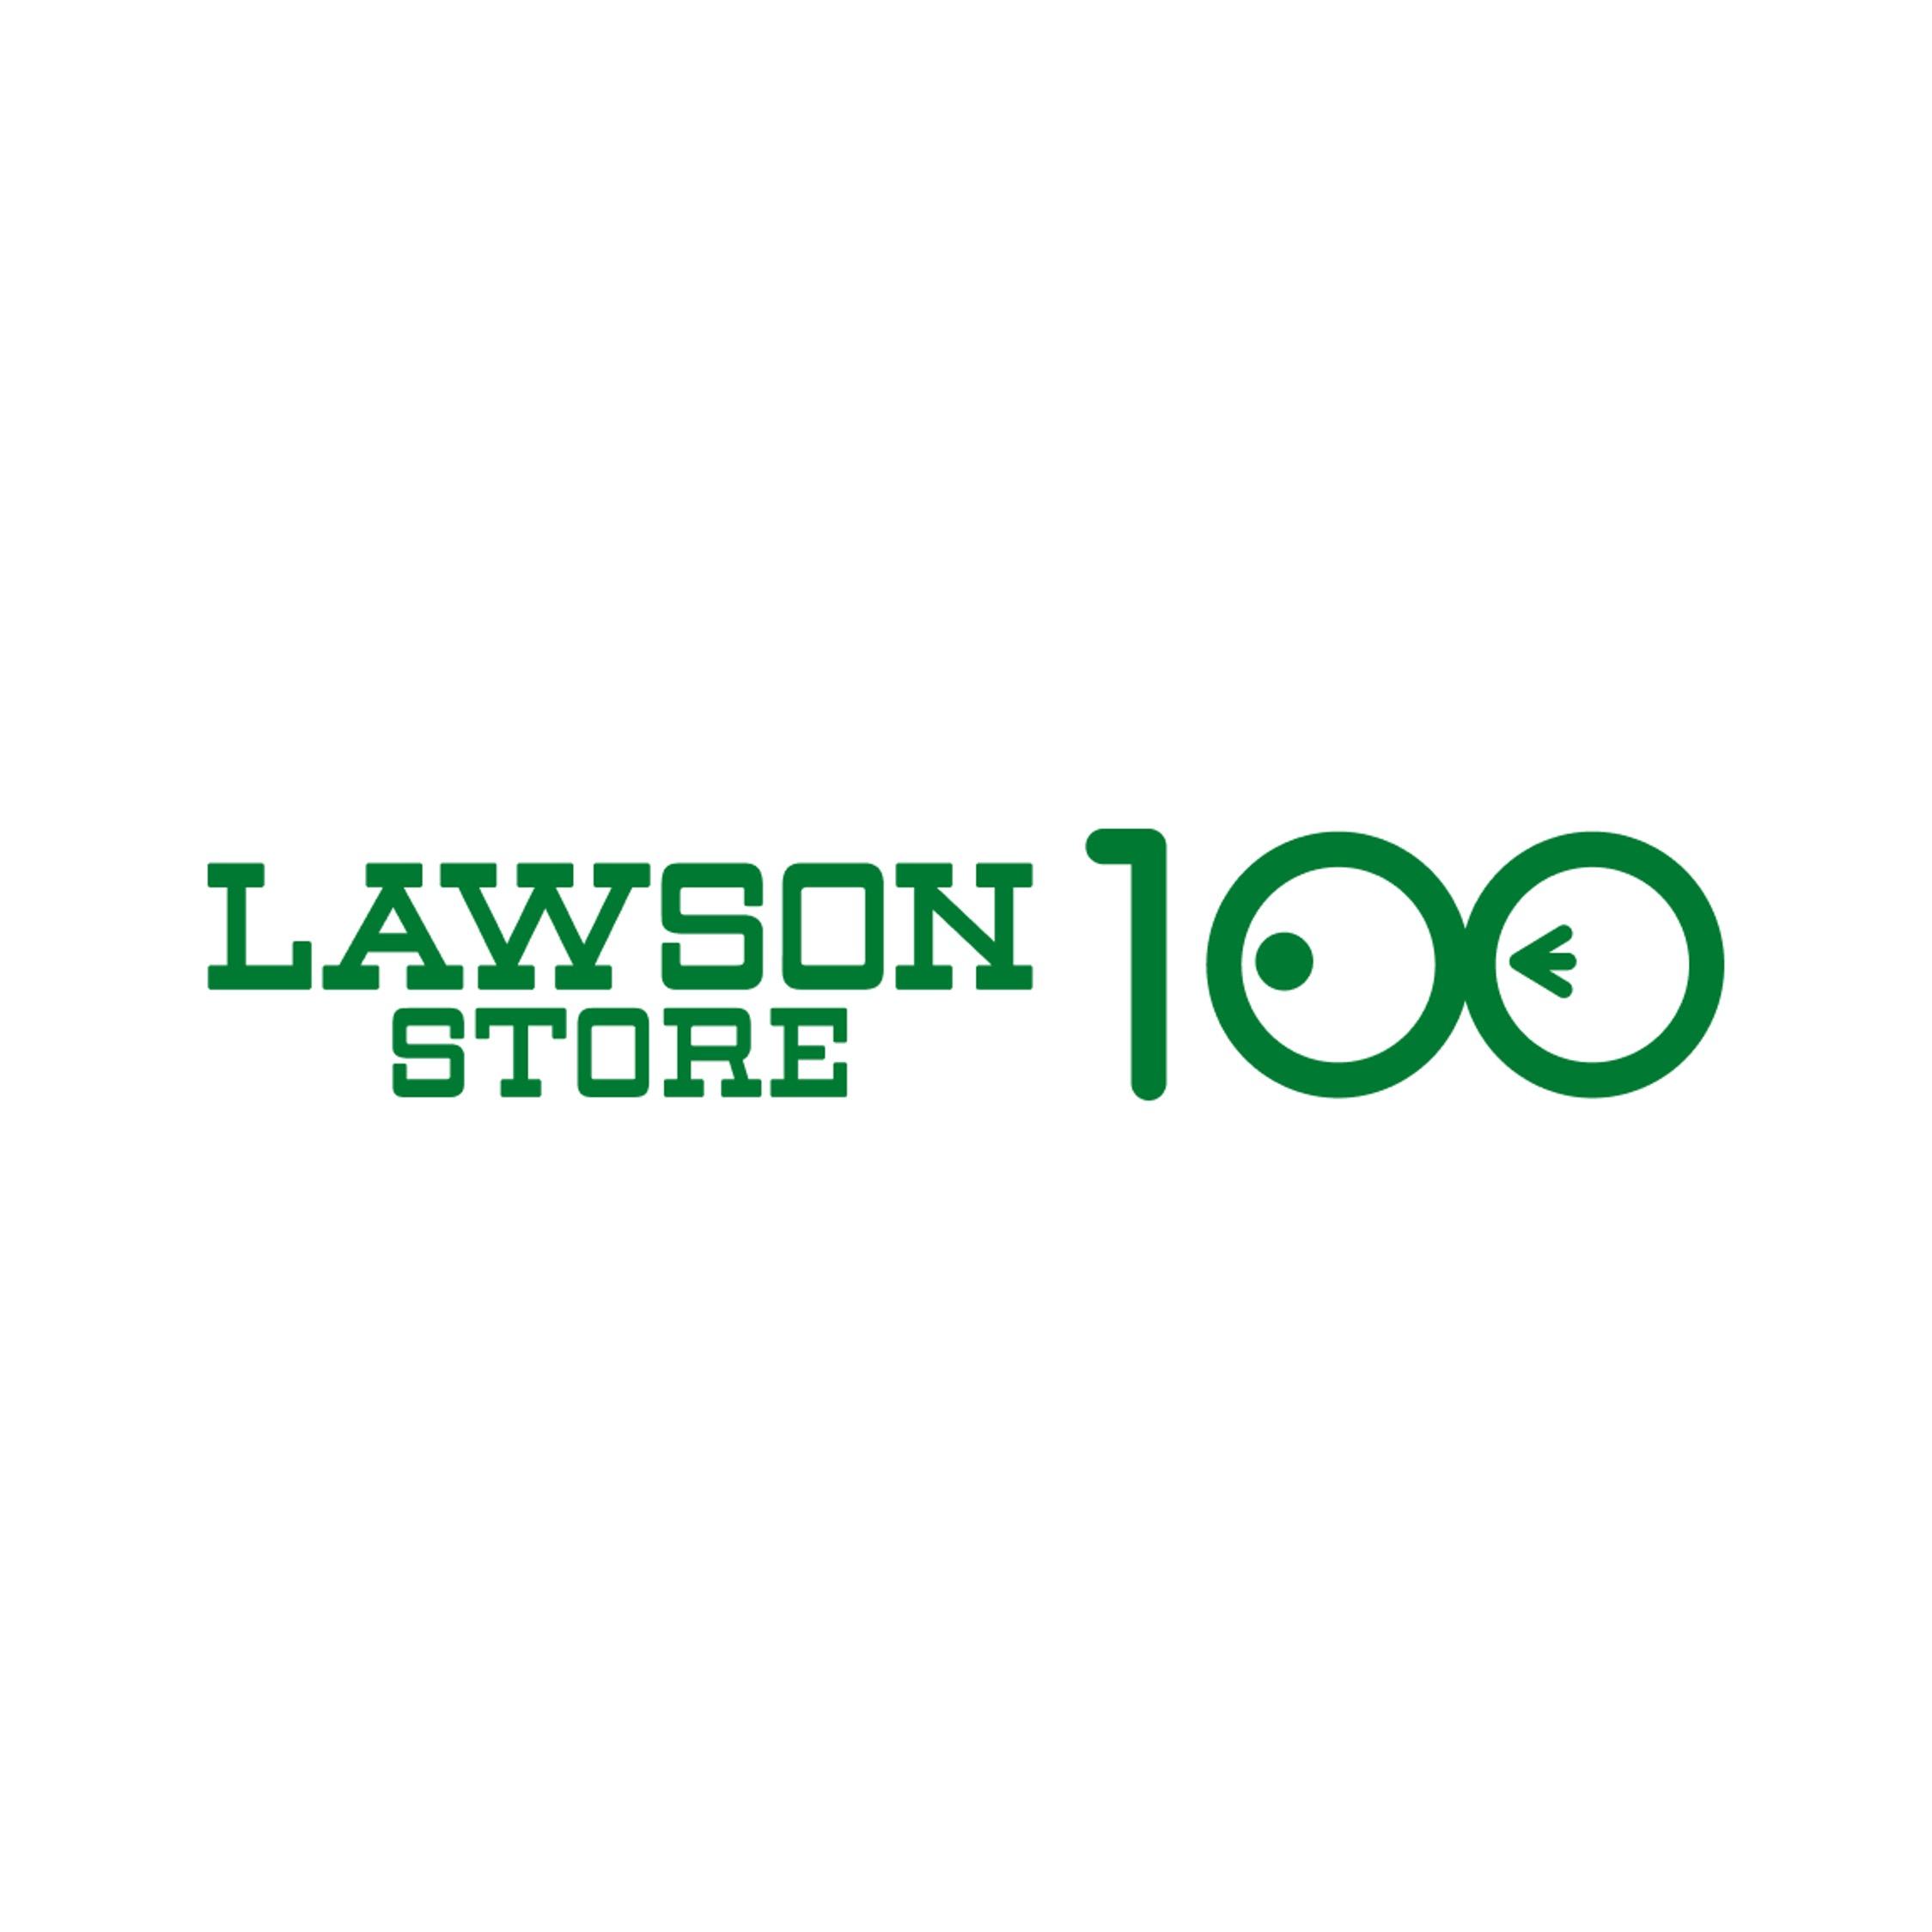 Logo lawsonstore100